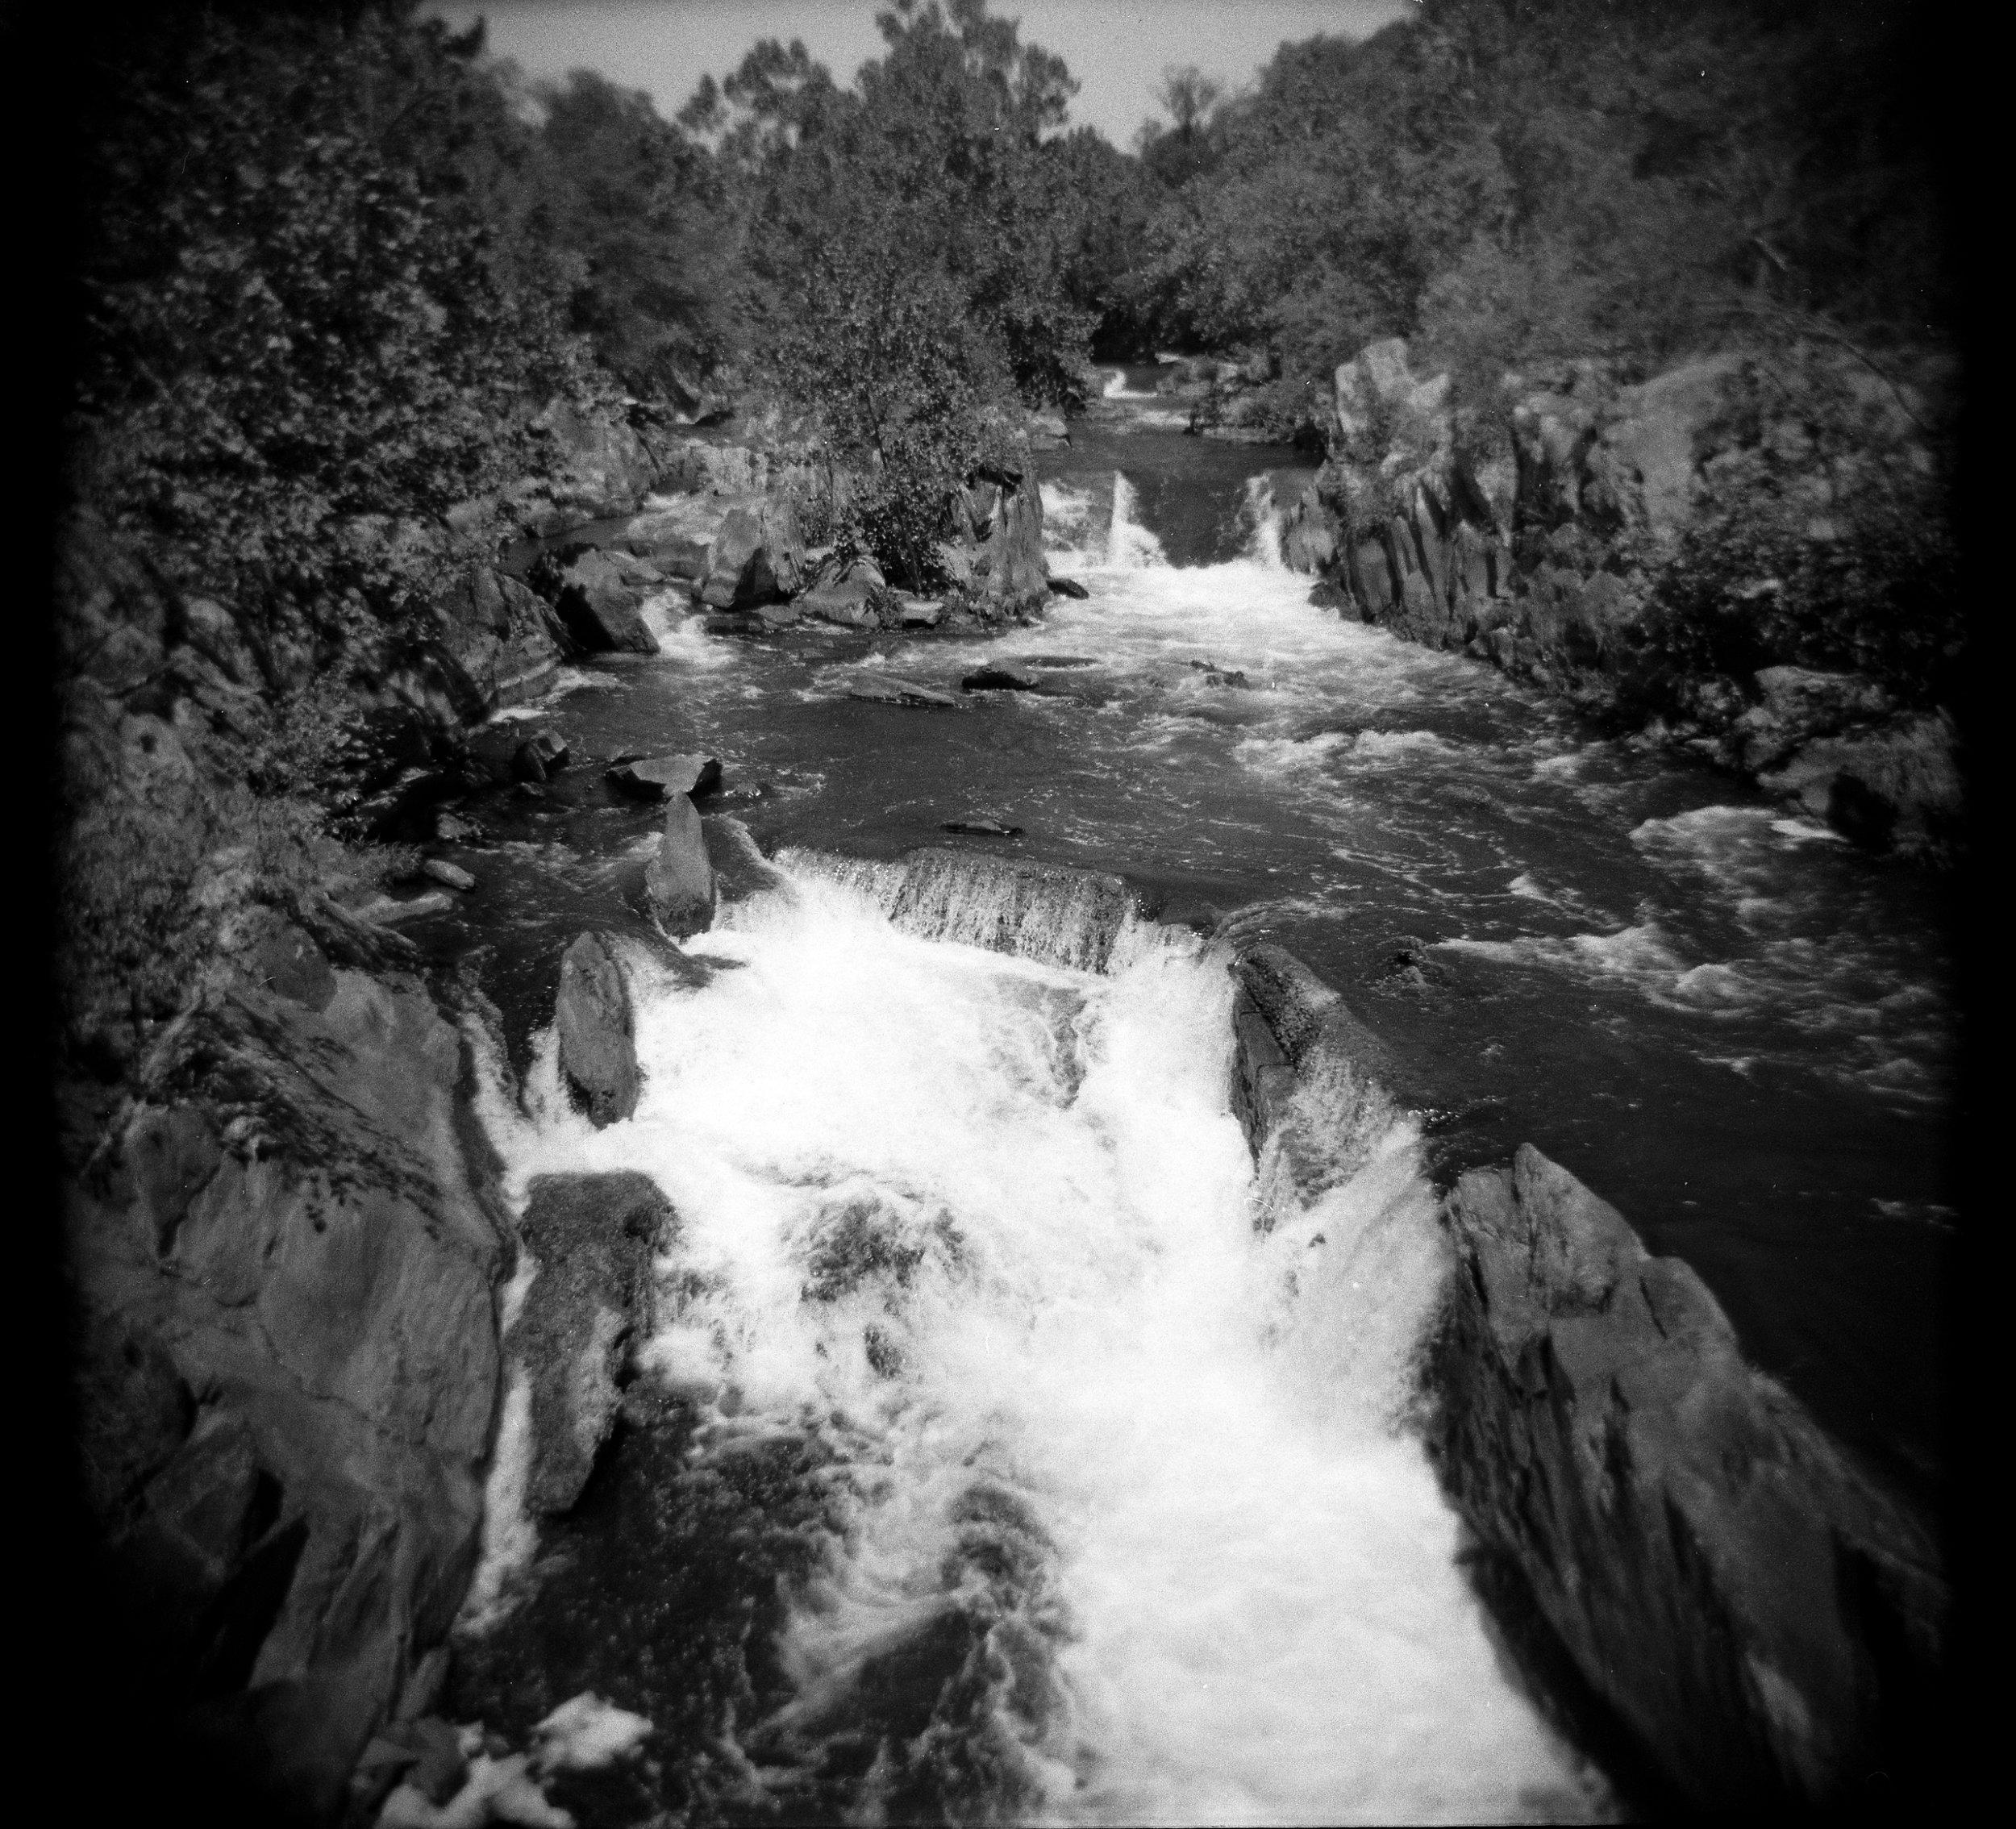 Great Falls, Virginia, 2009